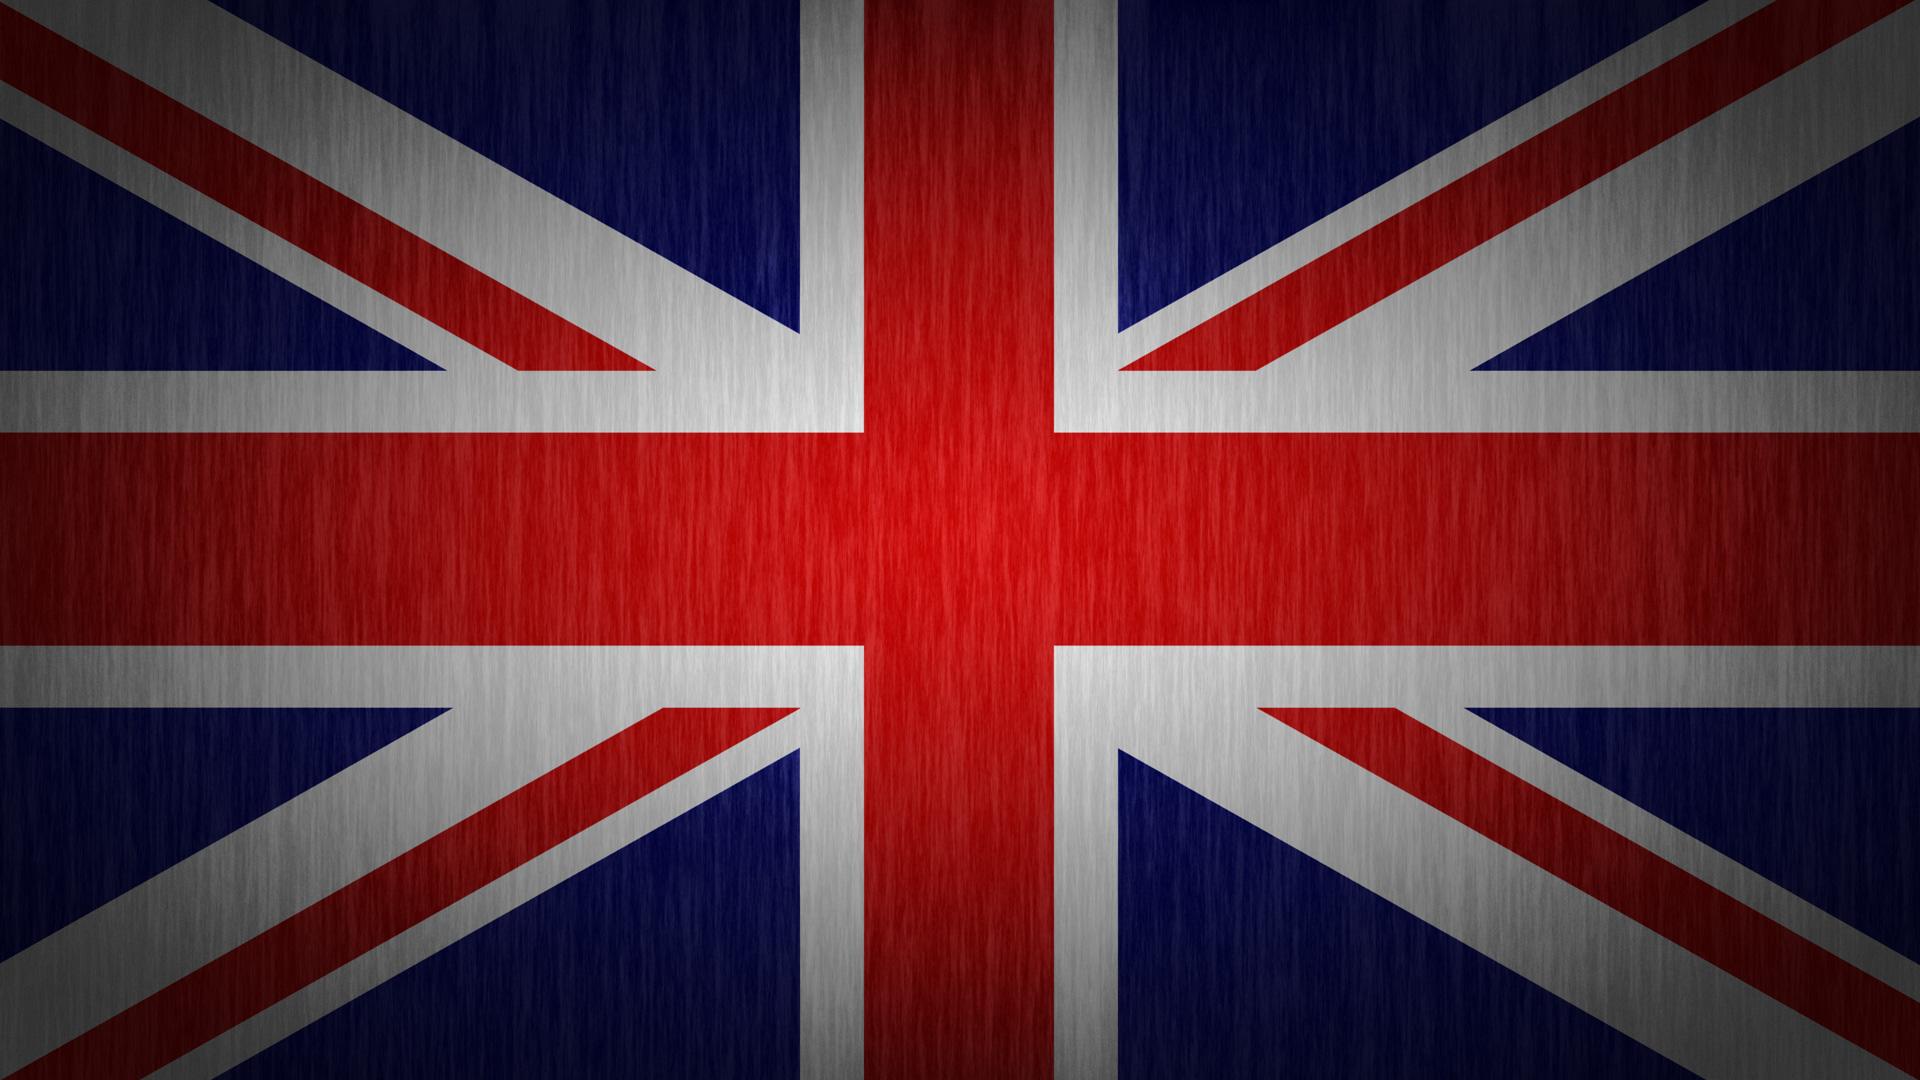 British United Kingdom Flag HD Wallpaper of Flag   hdwallpaper2013com 1920x1080